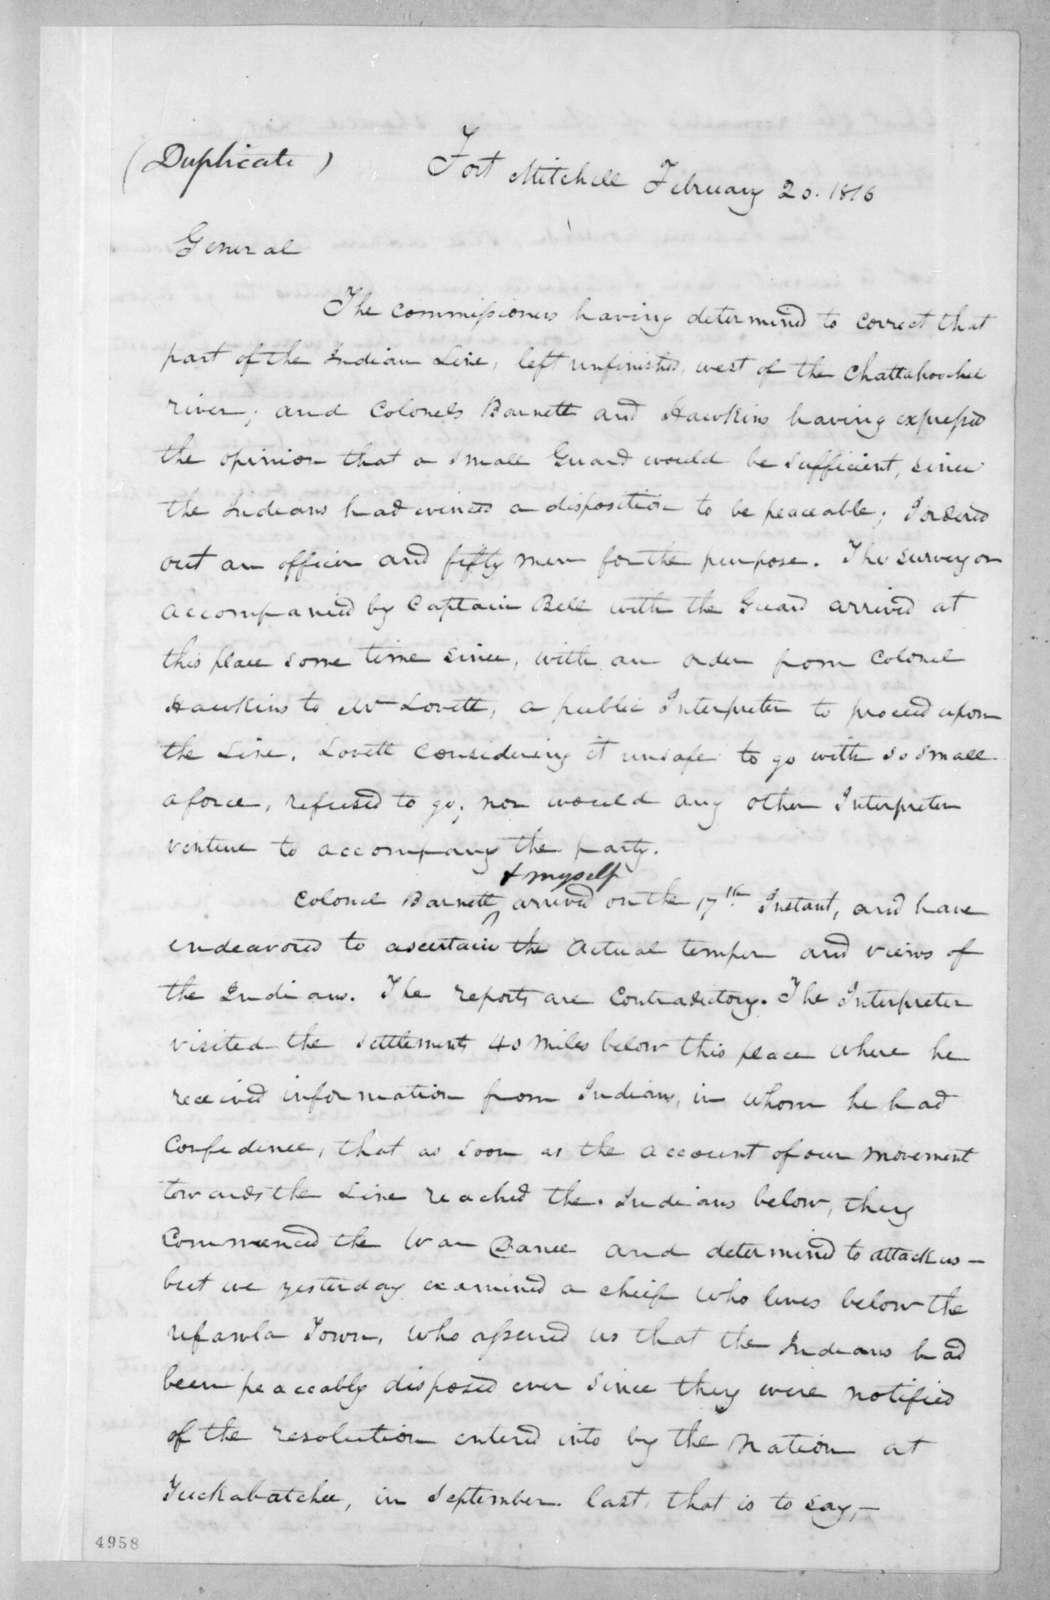 Edmund Pendleton Gaines to Andrew Jackson, February 20, 1816